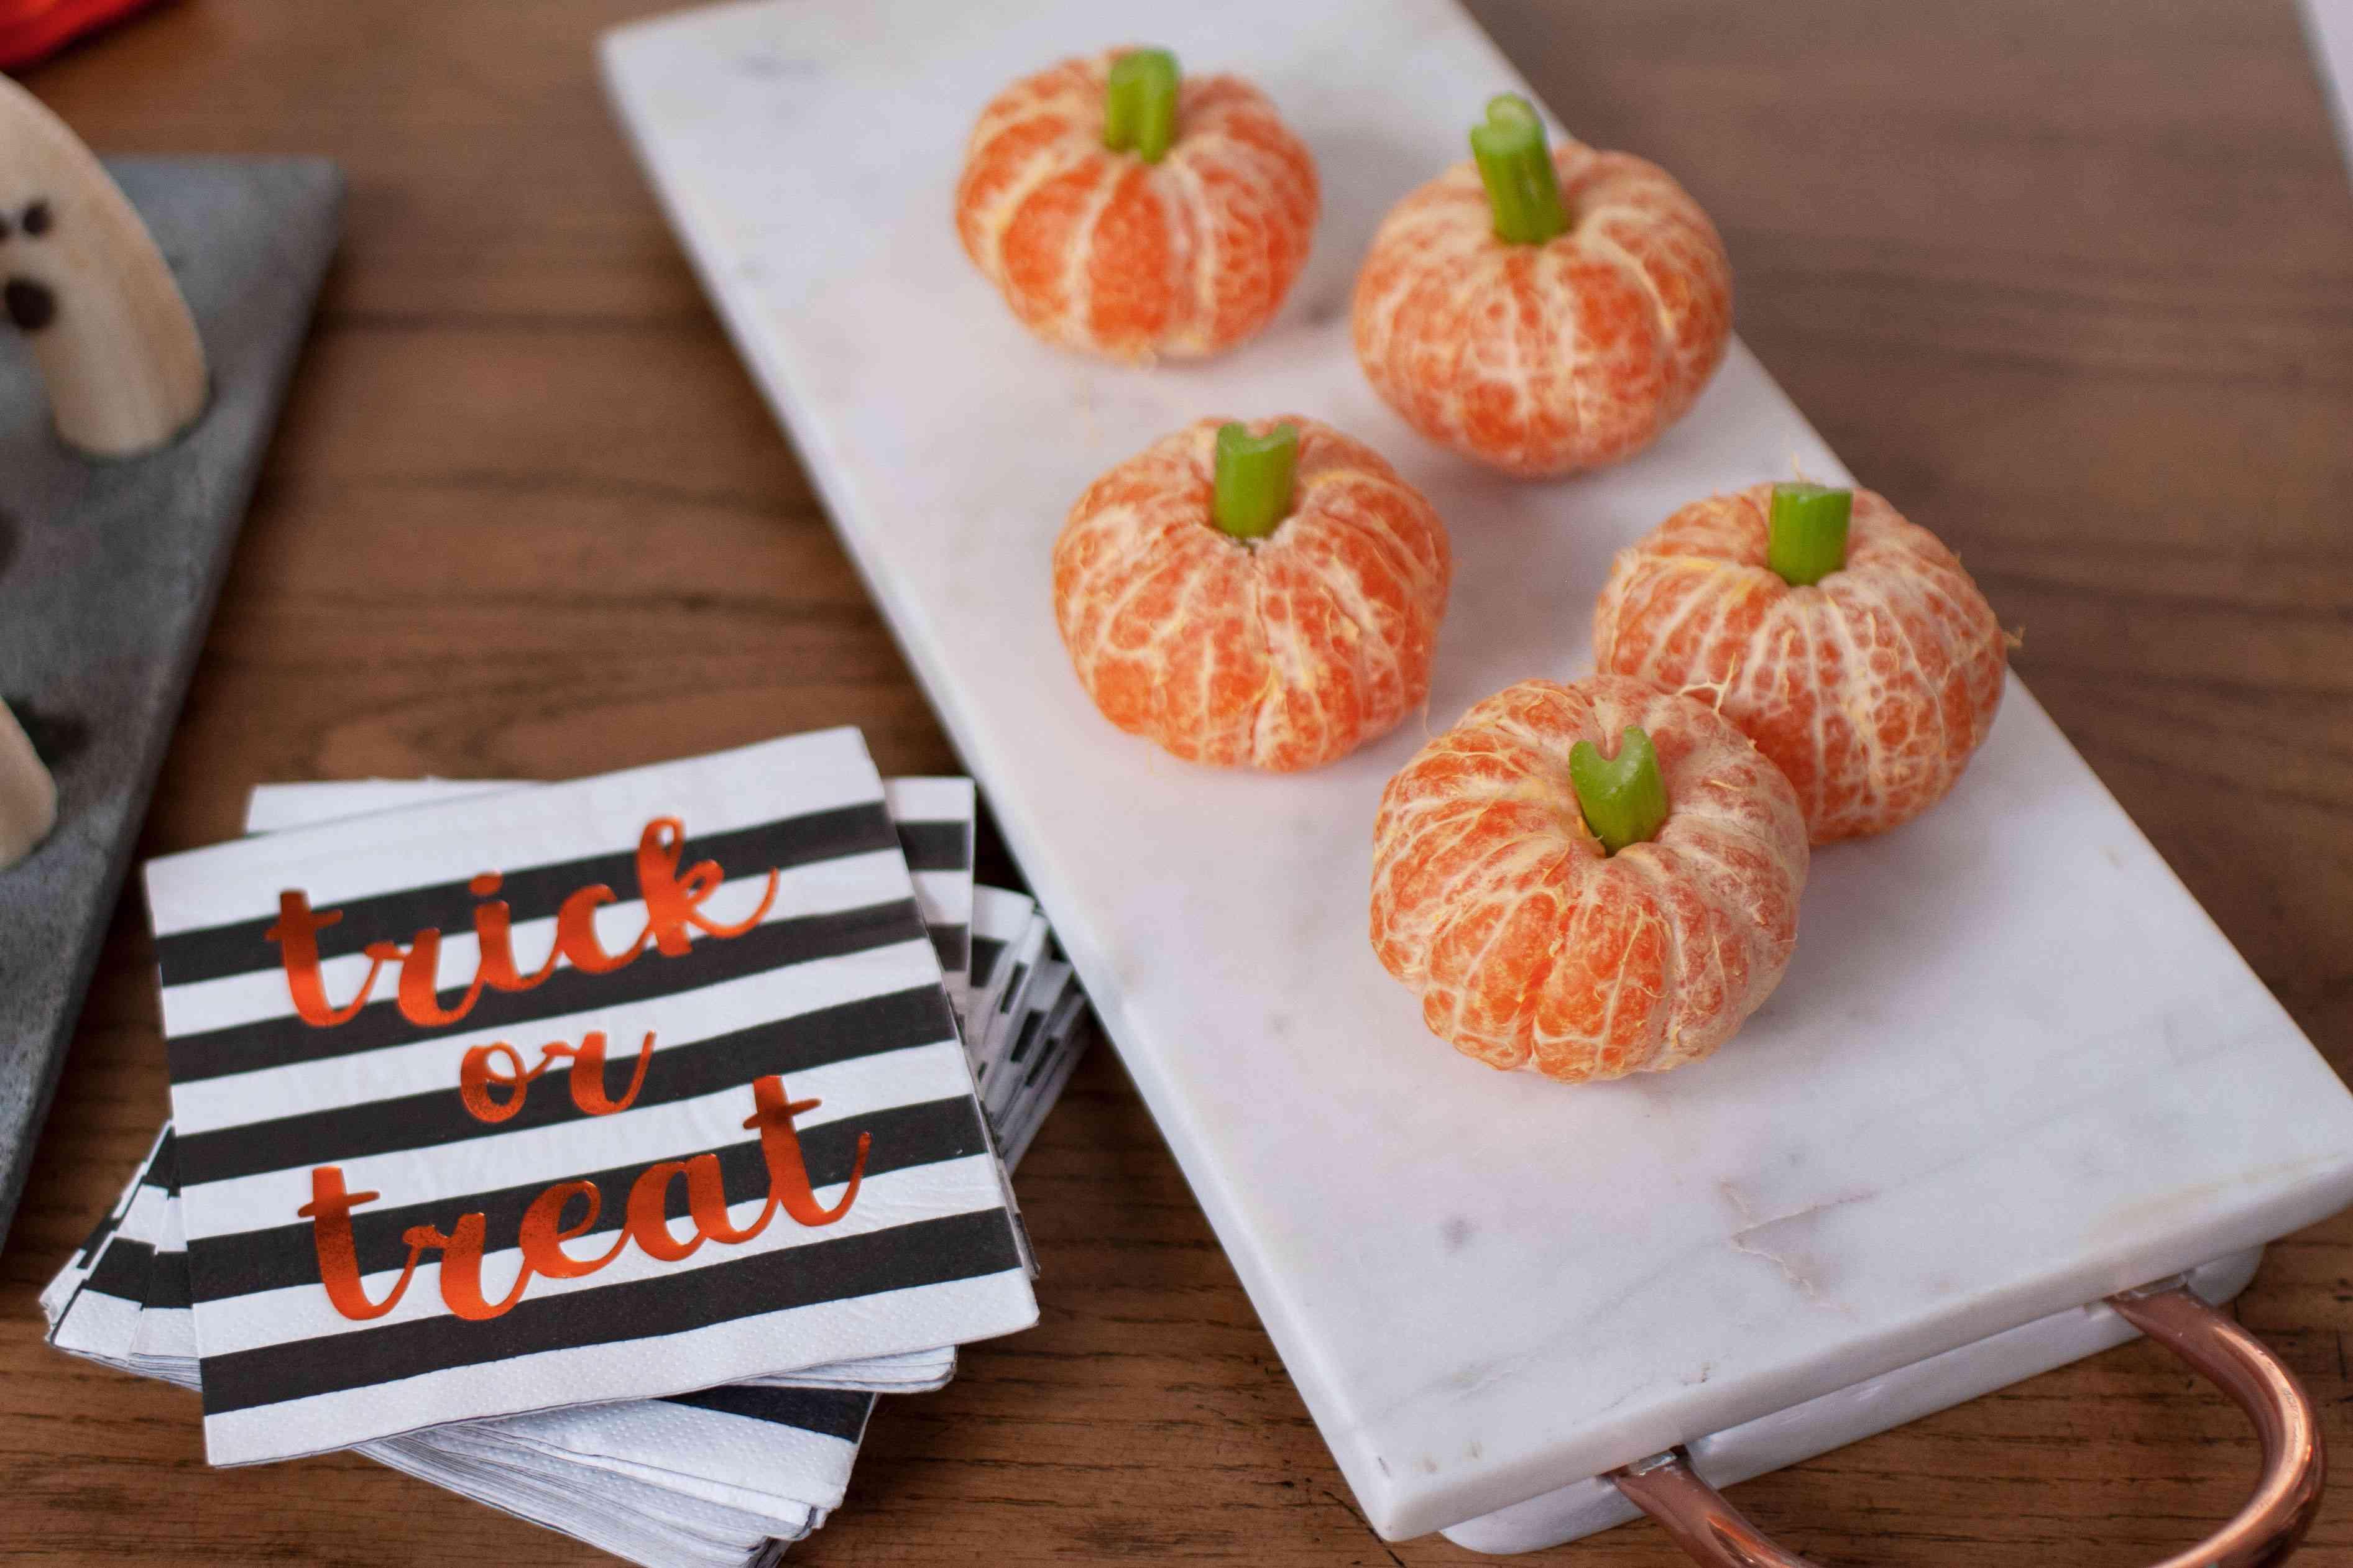 Pumpkins made of oranges and celery